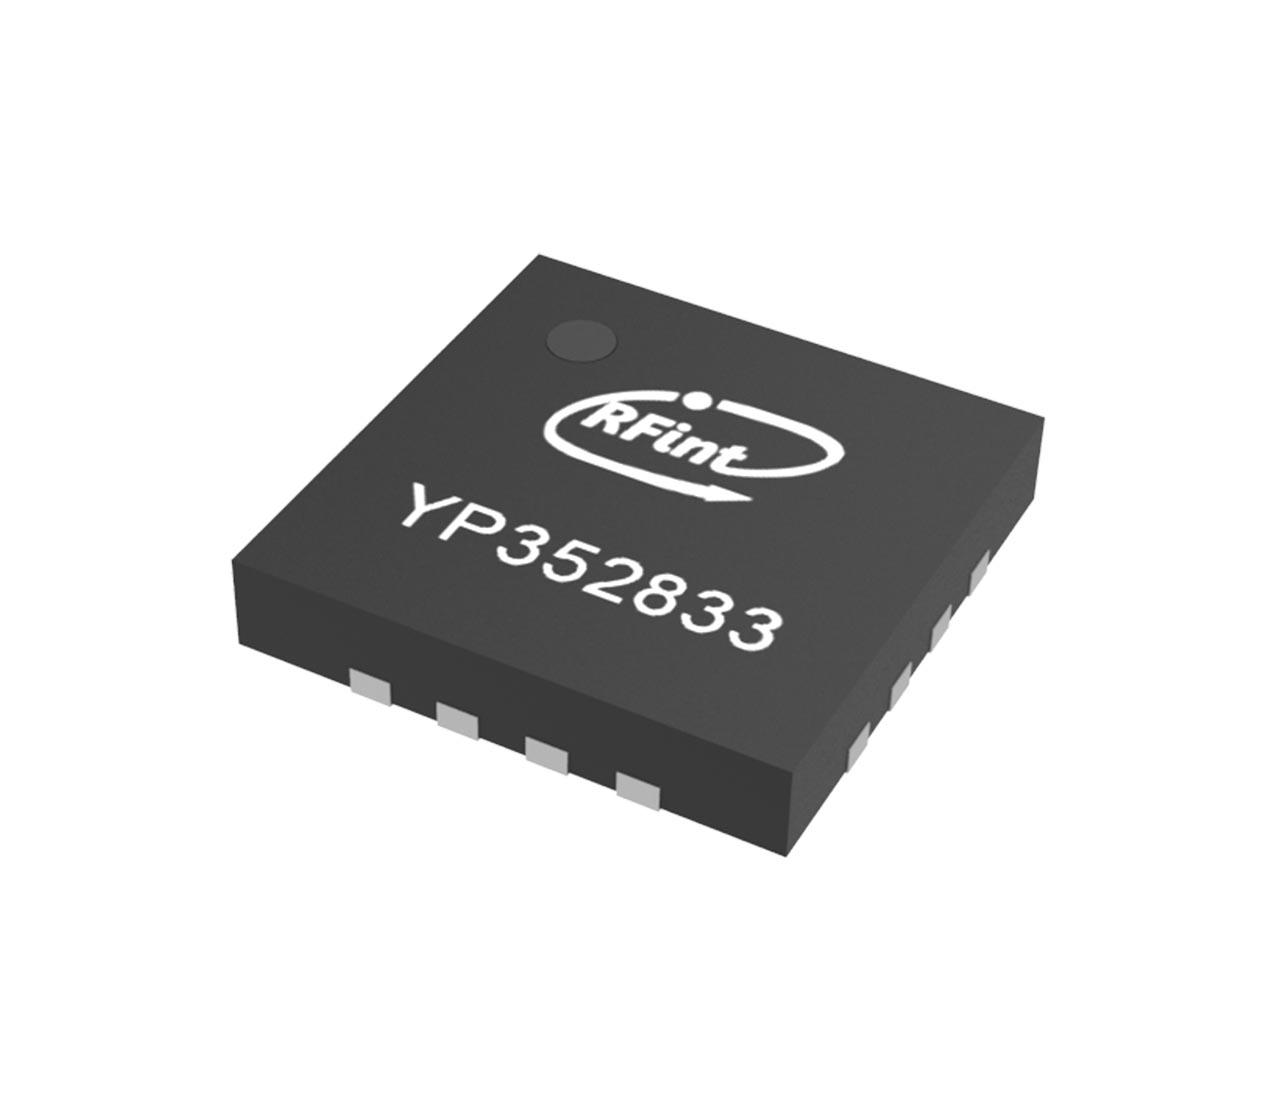 YP352833